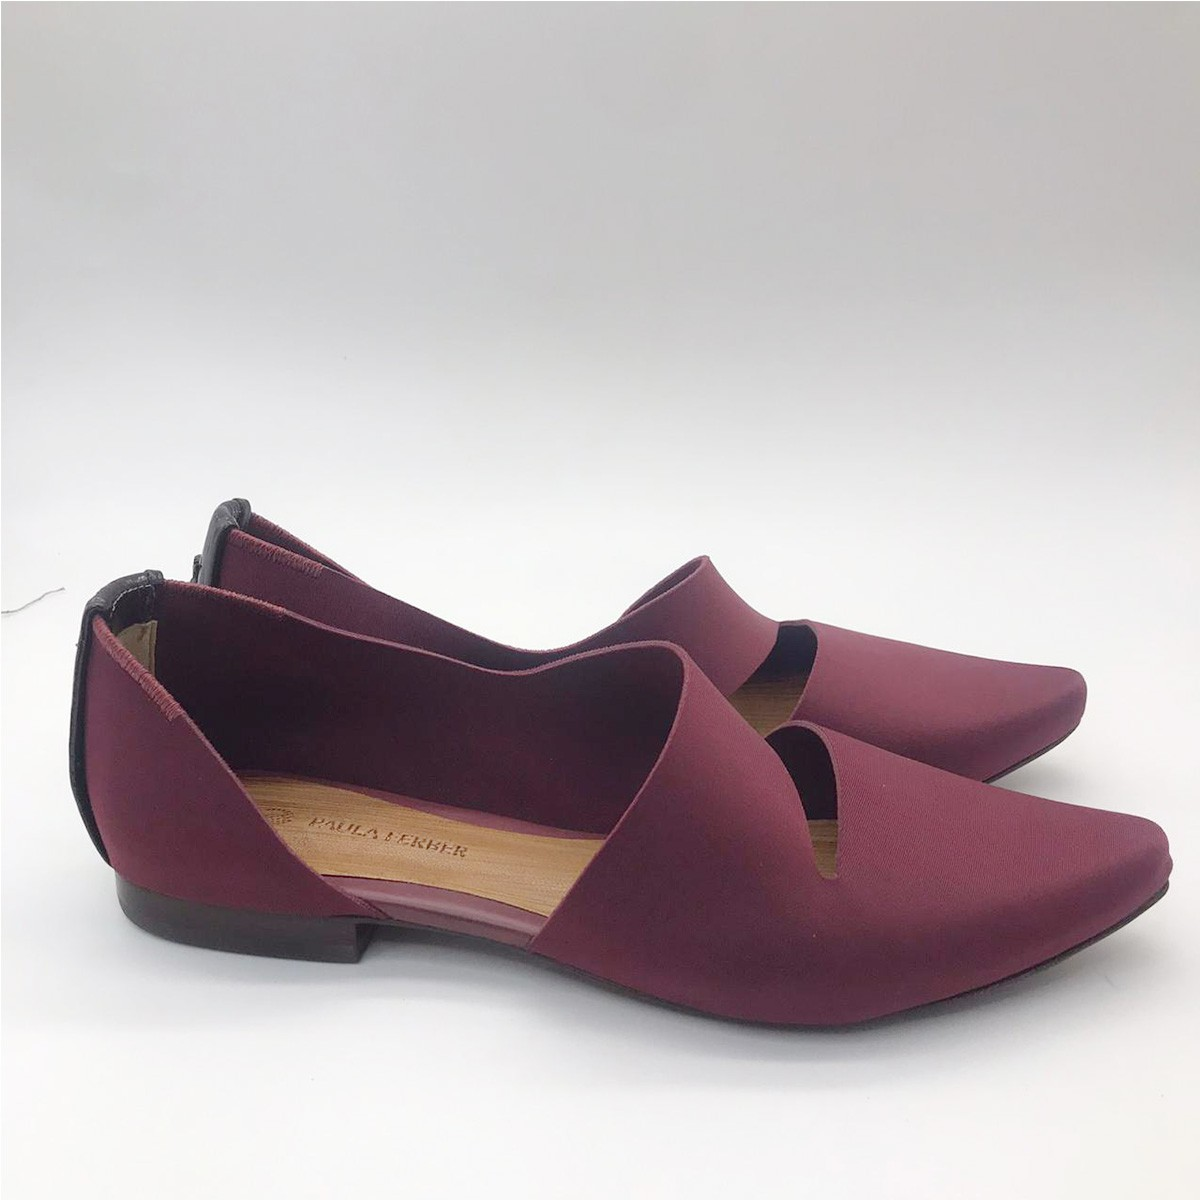 Sapato Paula Ferber VILLACURVA-I20 Neoprene